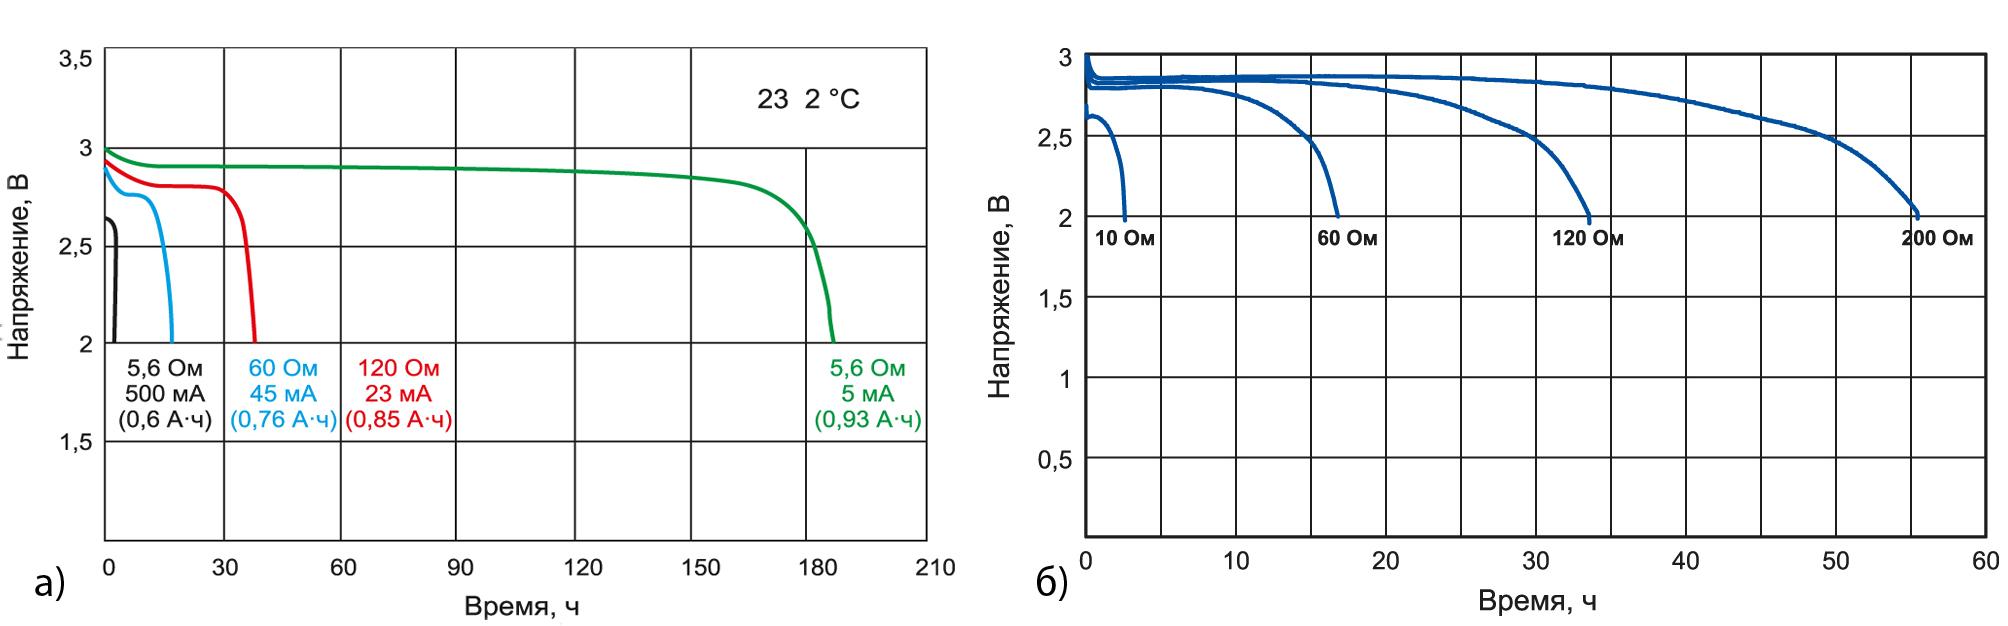 Разрядная характеристика батарей